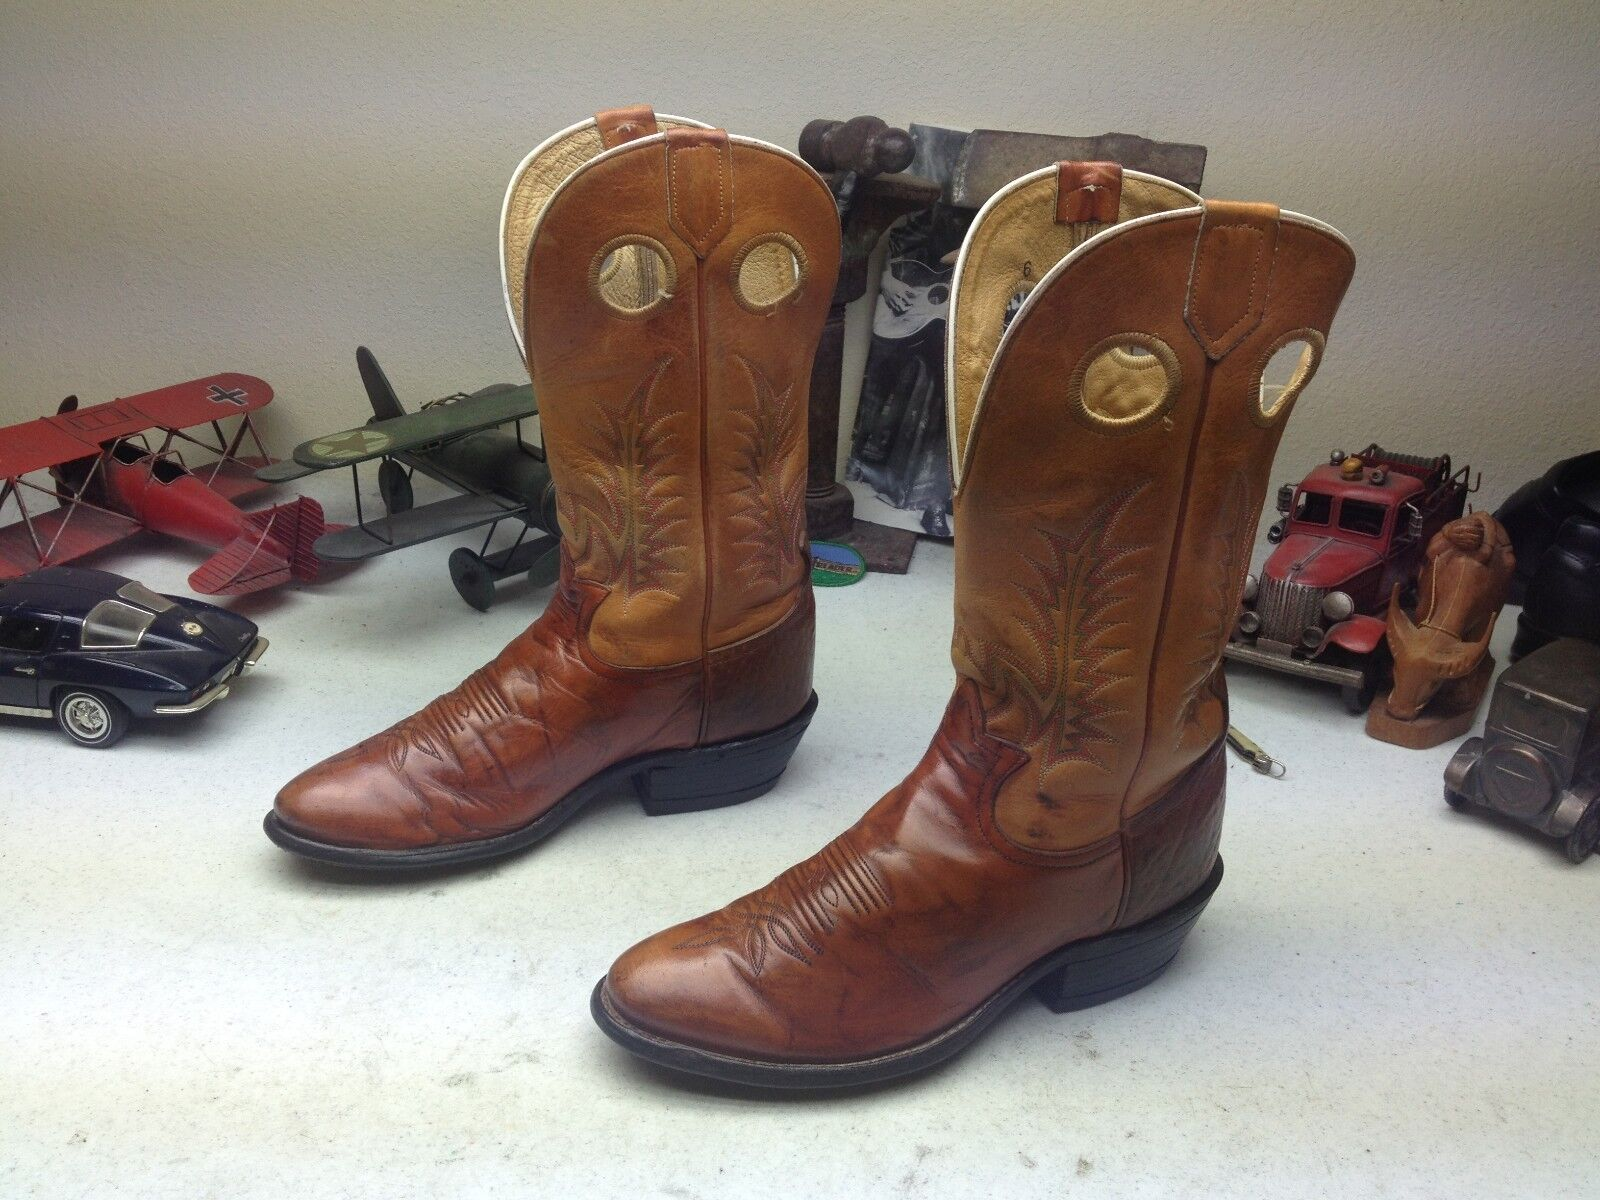 VINTAGE DISTRESSED TONY LAMA USA COGNAC BROWN LEATHER BUCKAROO RANCH BOOTS 7.5 D